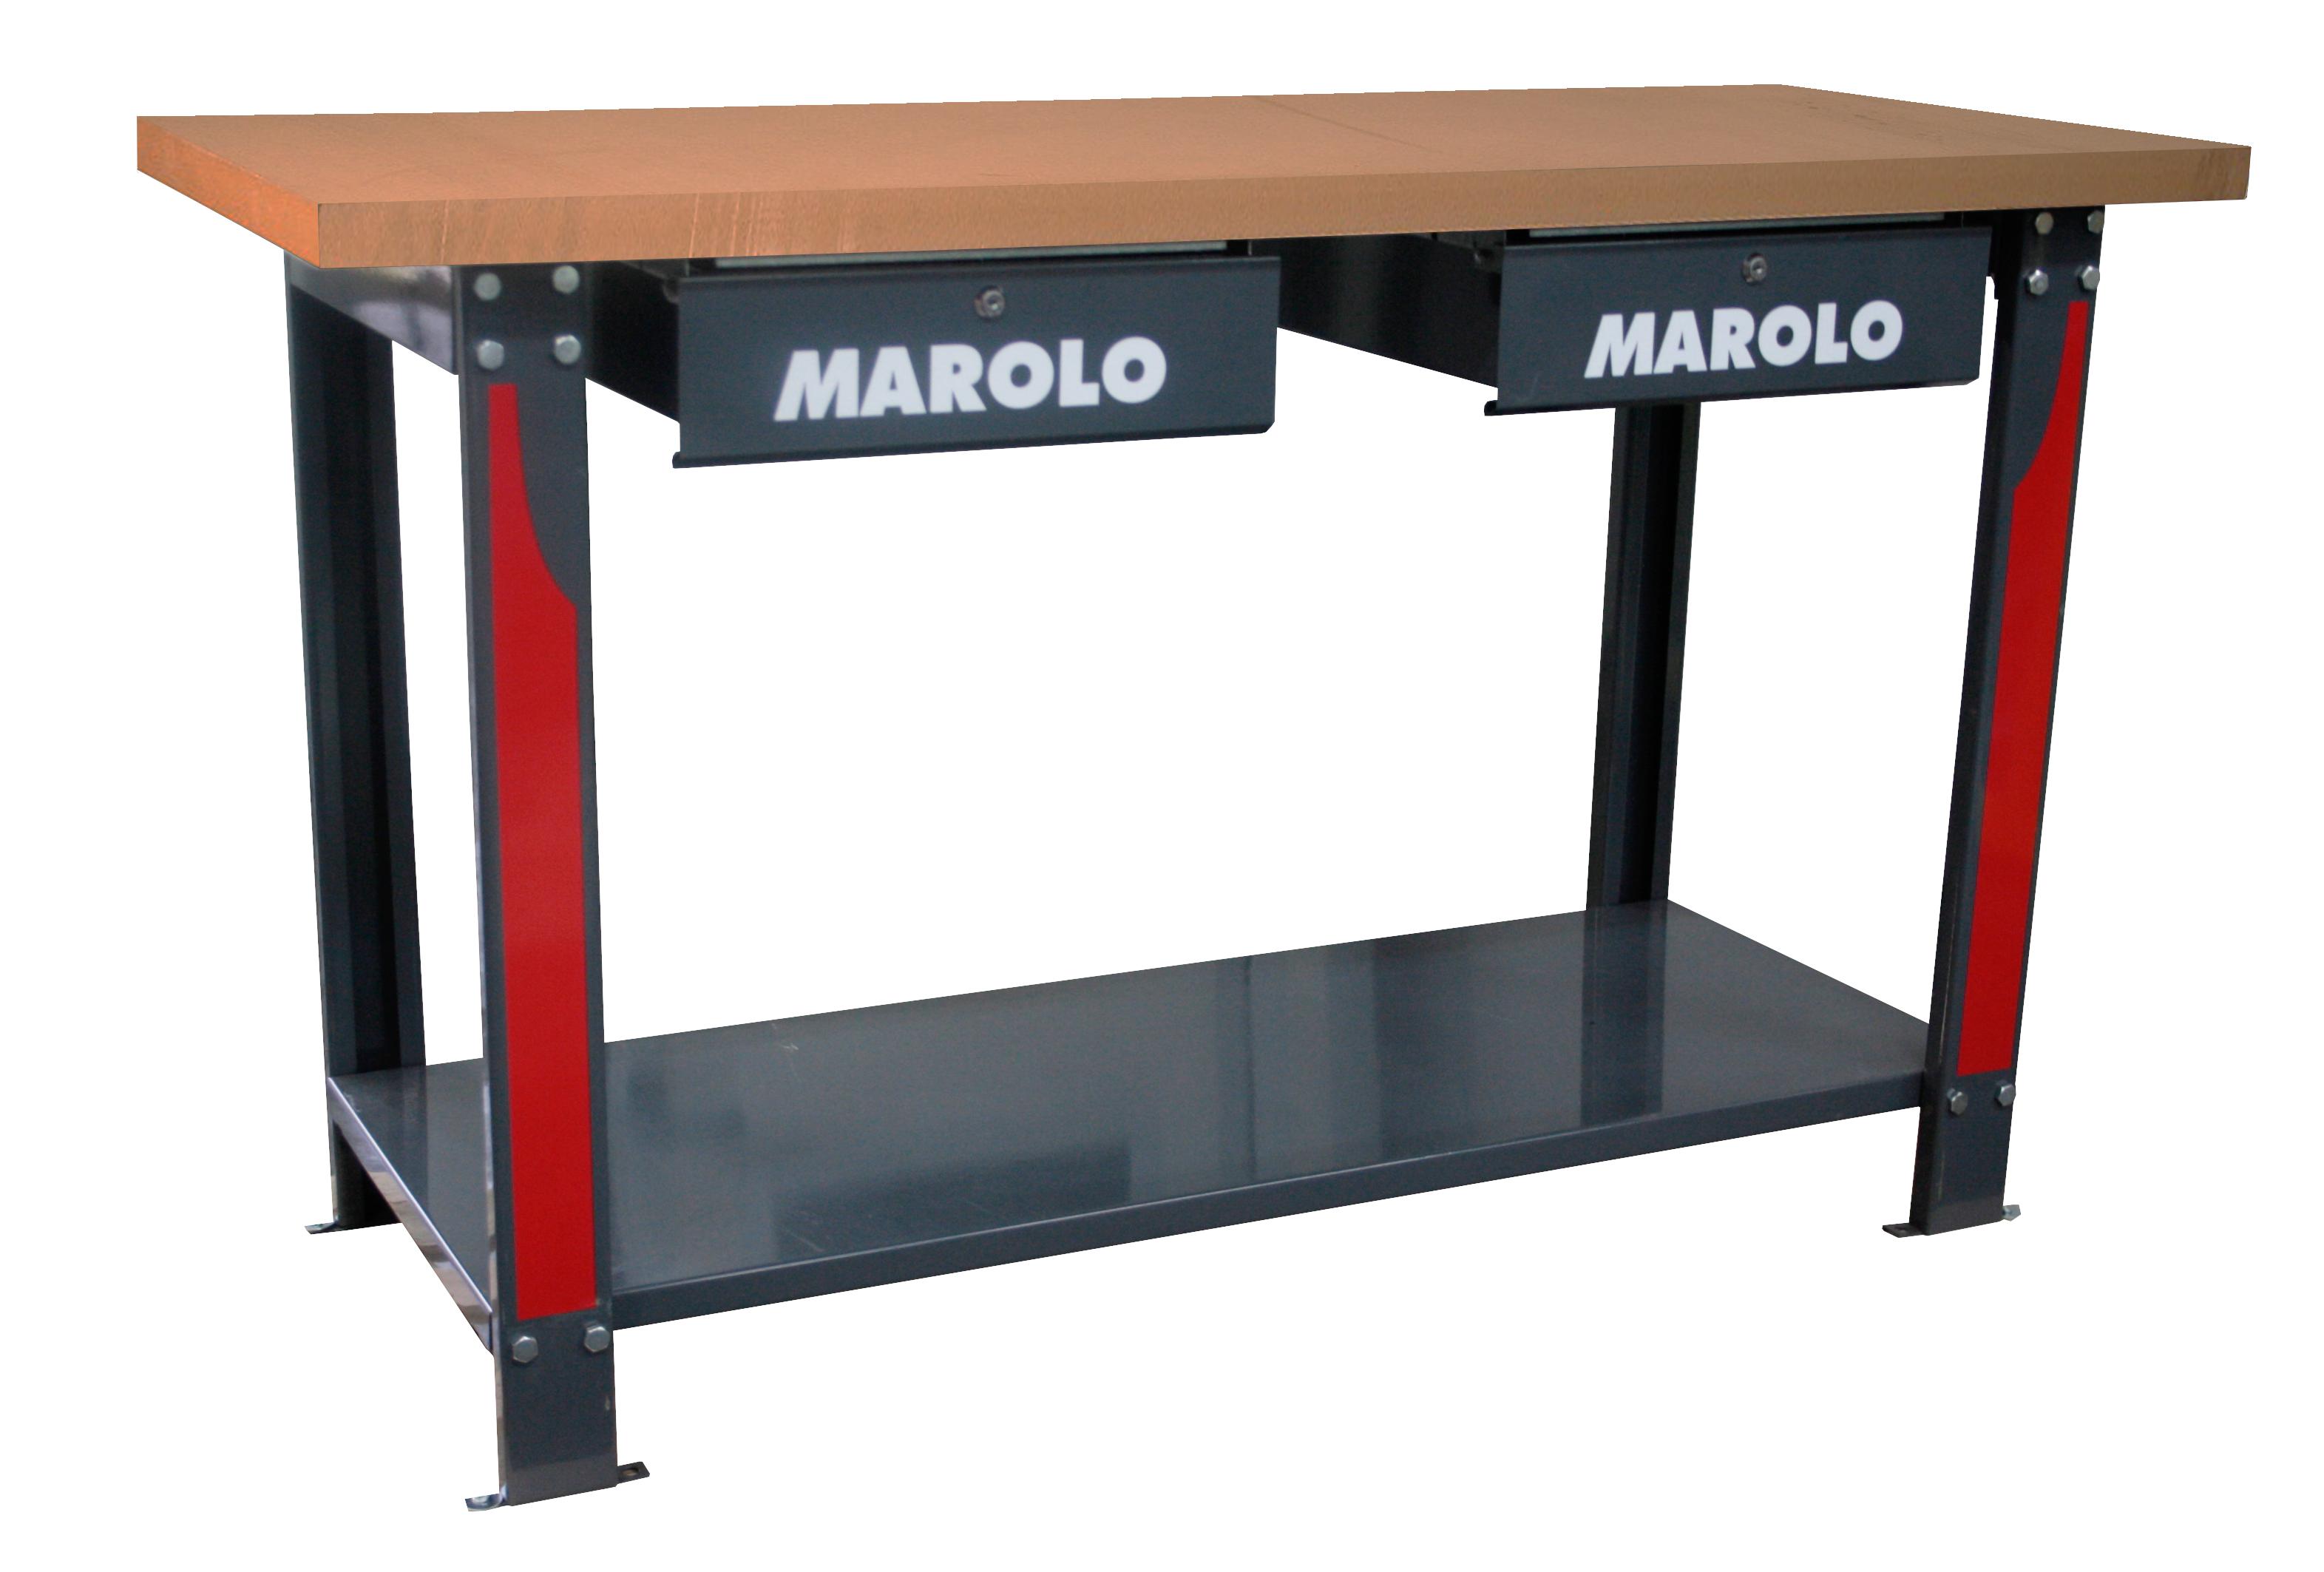 marolotest - werkbank holz 1.50 m - 2 schubladen